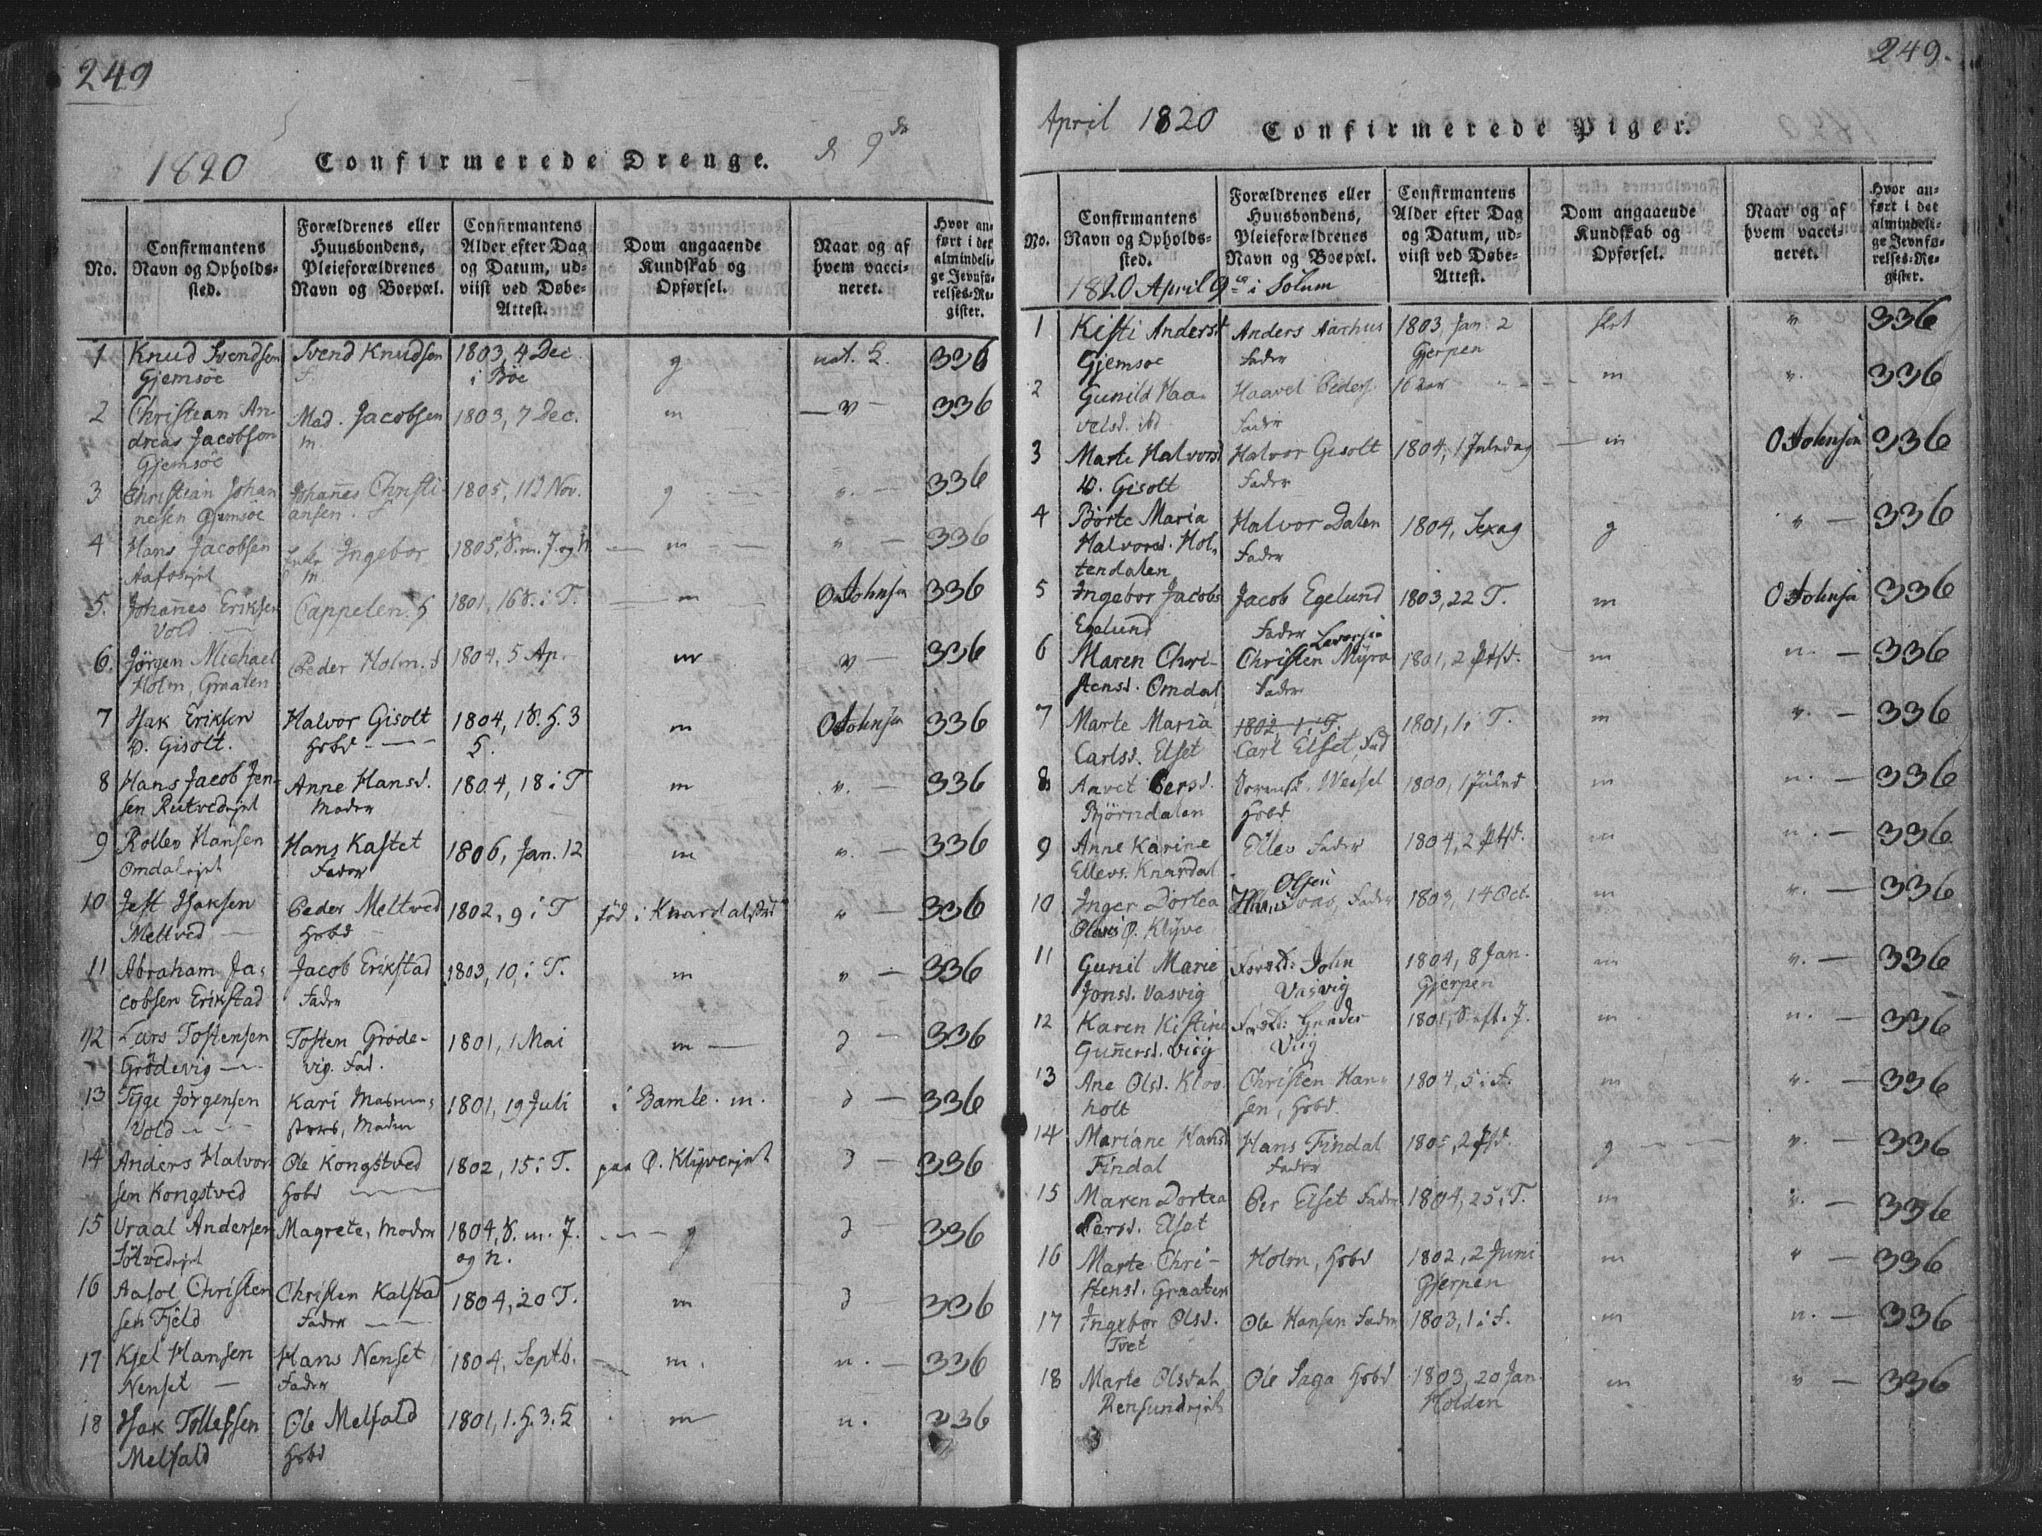 SAKO, Solum kirkebøker, F/Fa/L0004: Ministerialbok nr. I 4, 1814-1833, s. 249